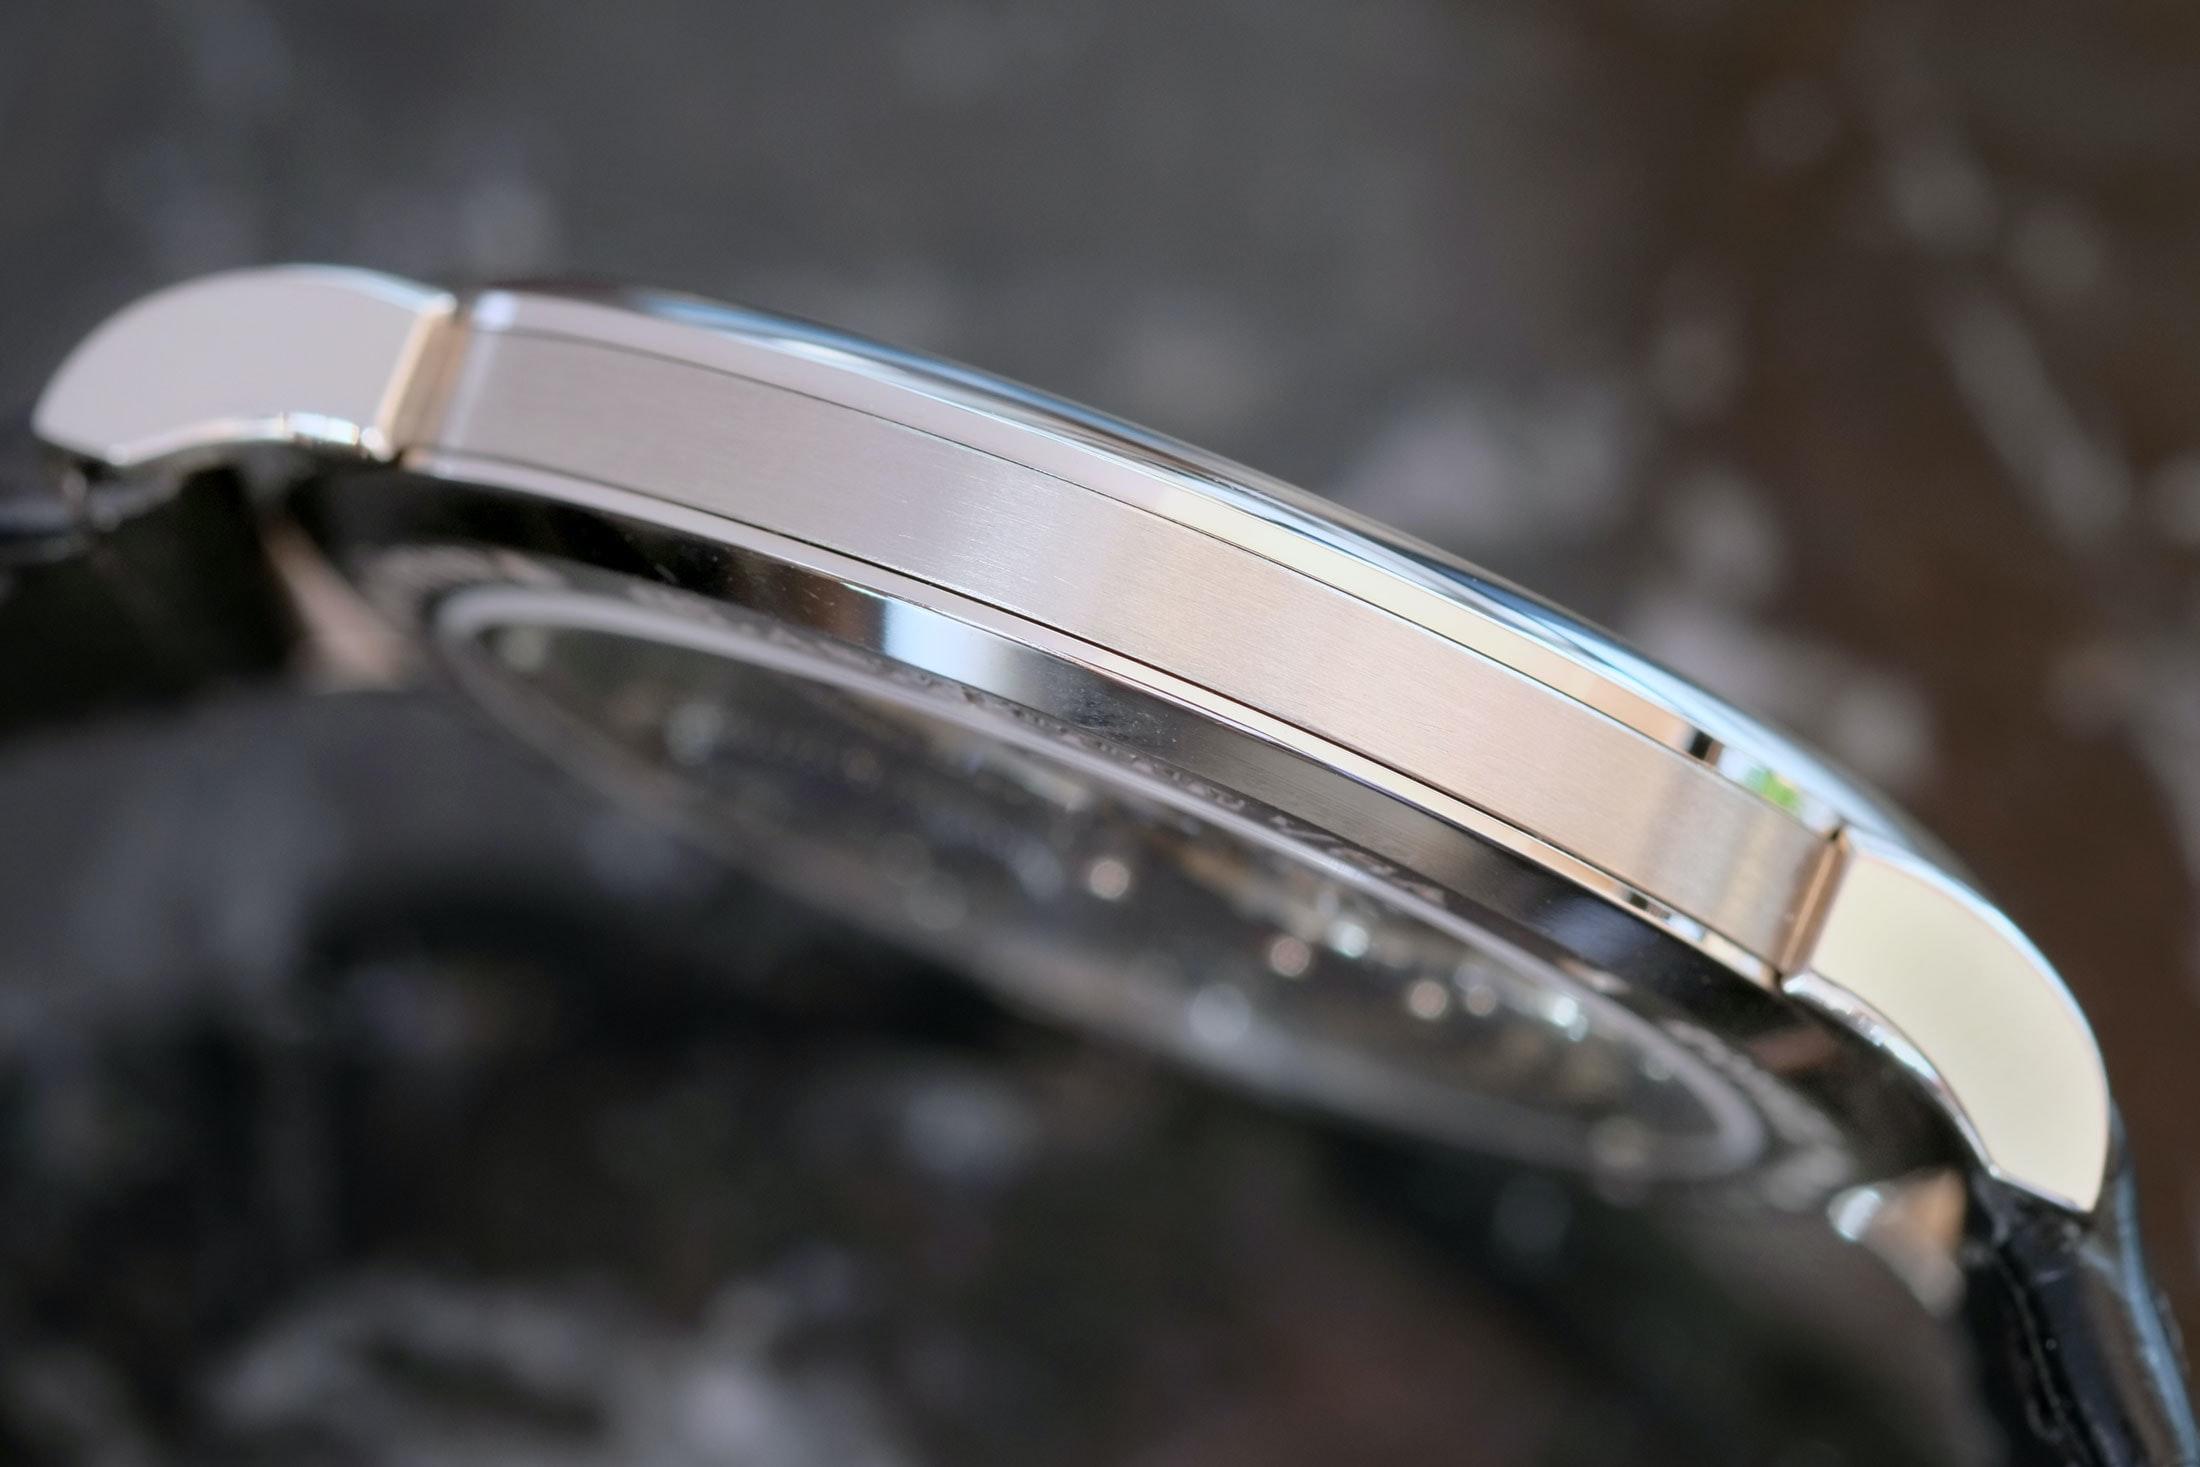 lange sohne saxonia thin case finishing A Week On The Wrist: The A. Lange & Söhne Saxonia Thin 37mm A Week On The Wrist: The A. Lange & Söhne Saxonia Thin 37mm lange saxonia 16